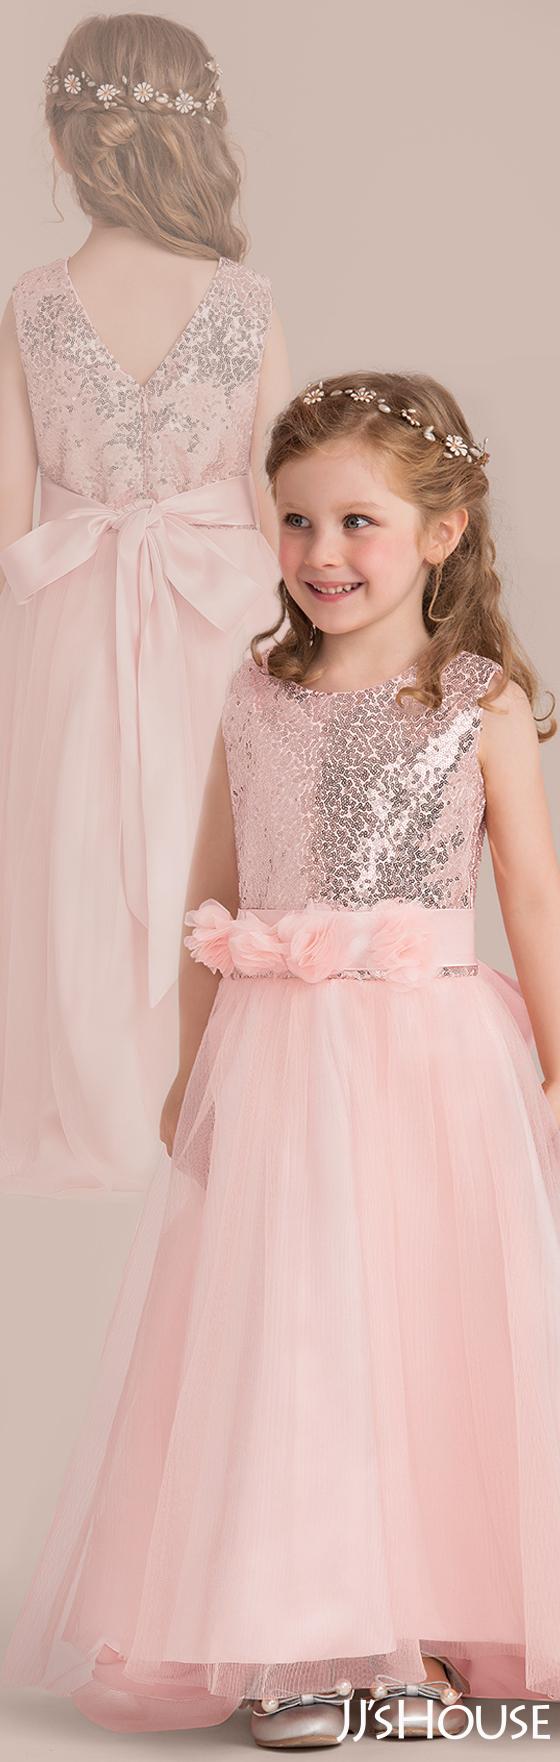 A-Line/Princess Floor-length Flower Girl Dress - Tulle/Sequined ...